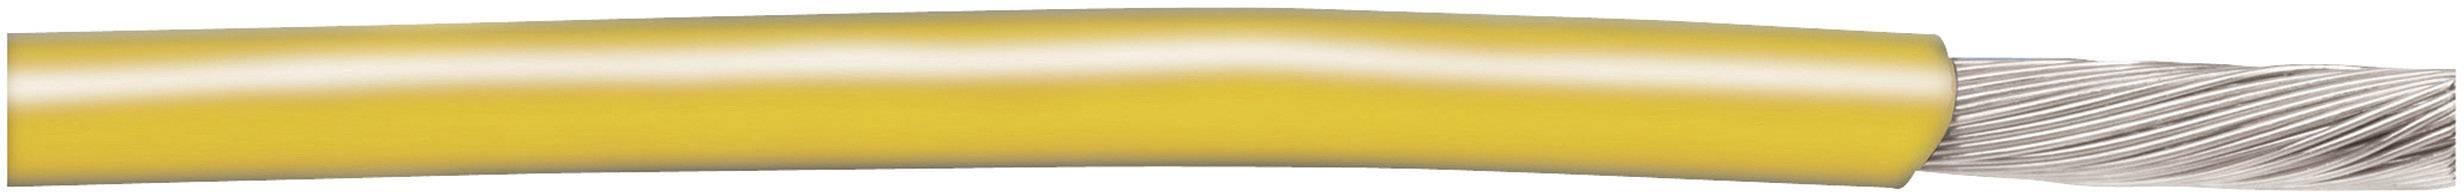 Pletenica 1 x 0.52 mm, rumena AlphaWire 3053 YL001 cena za meter